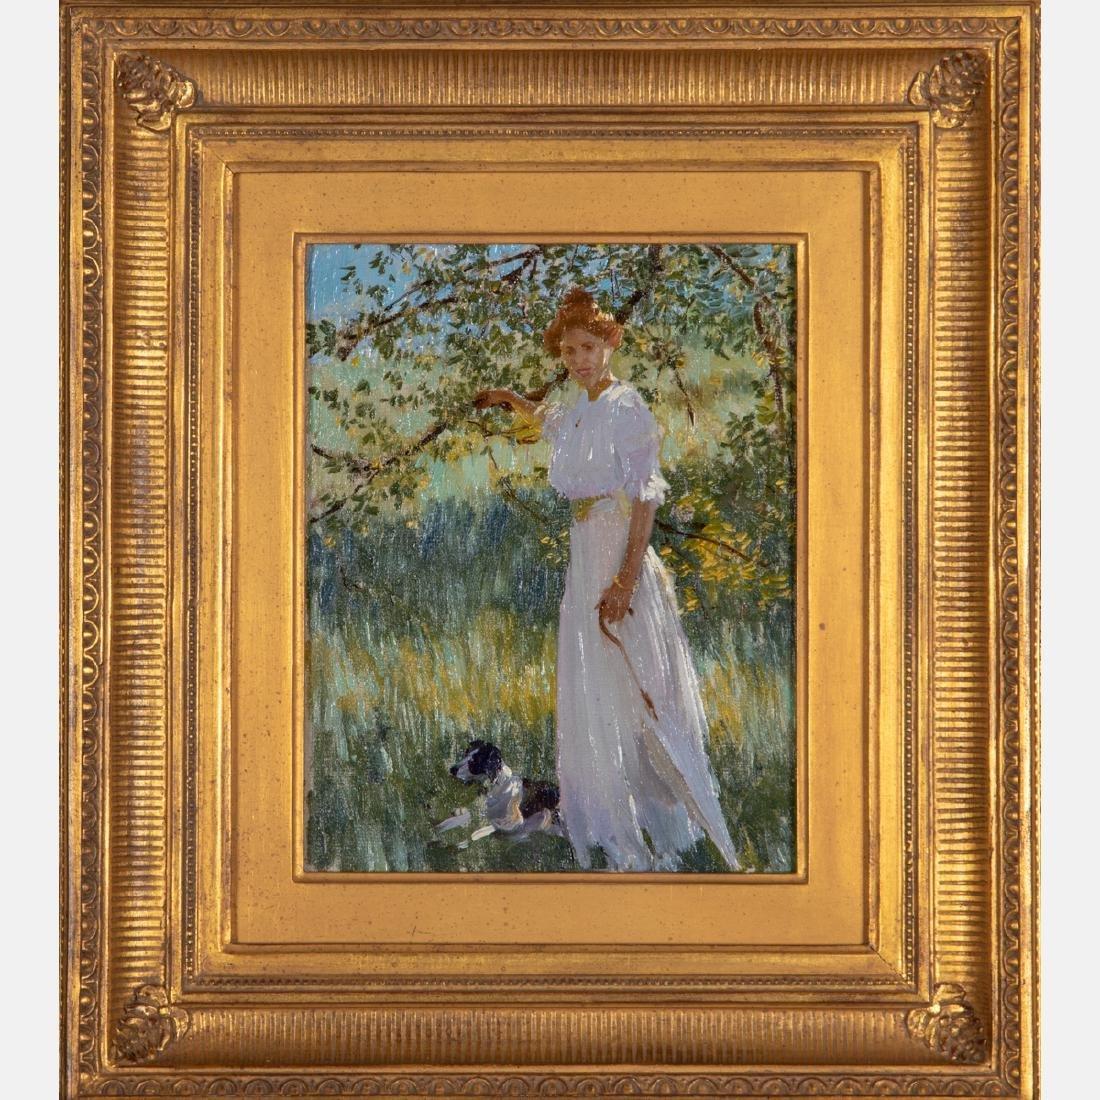 Edward Dufner (American, 1871-1957) Sunlit Portrait, - 2